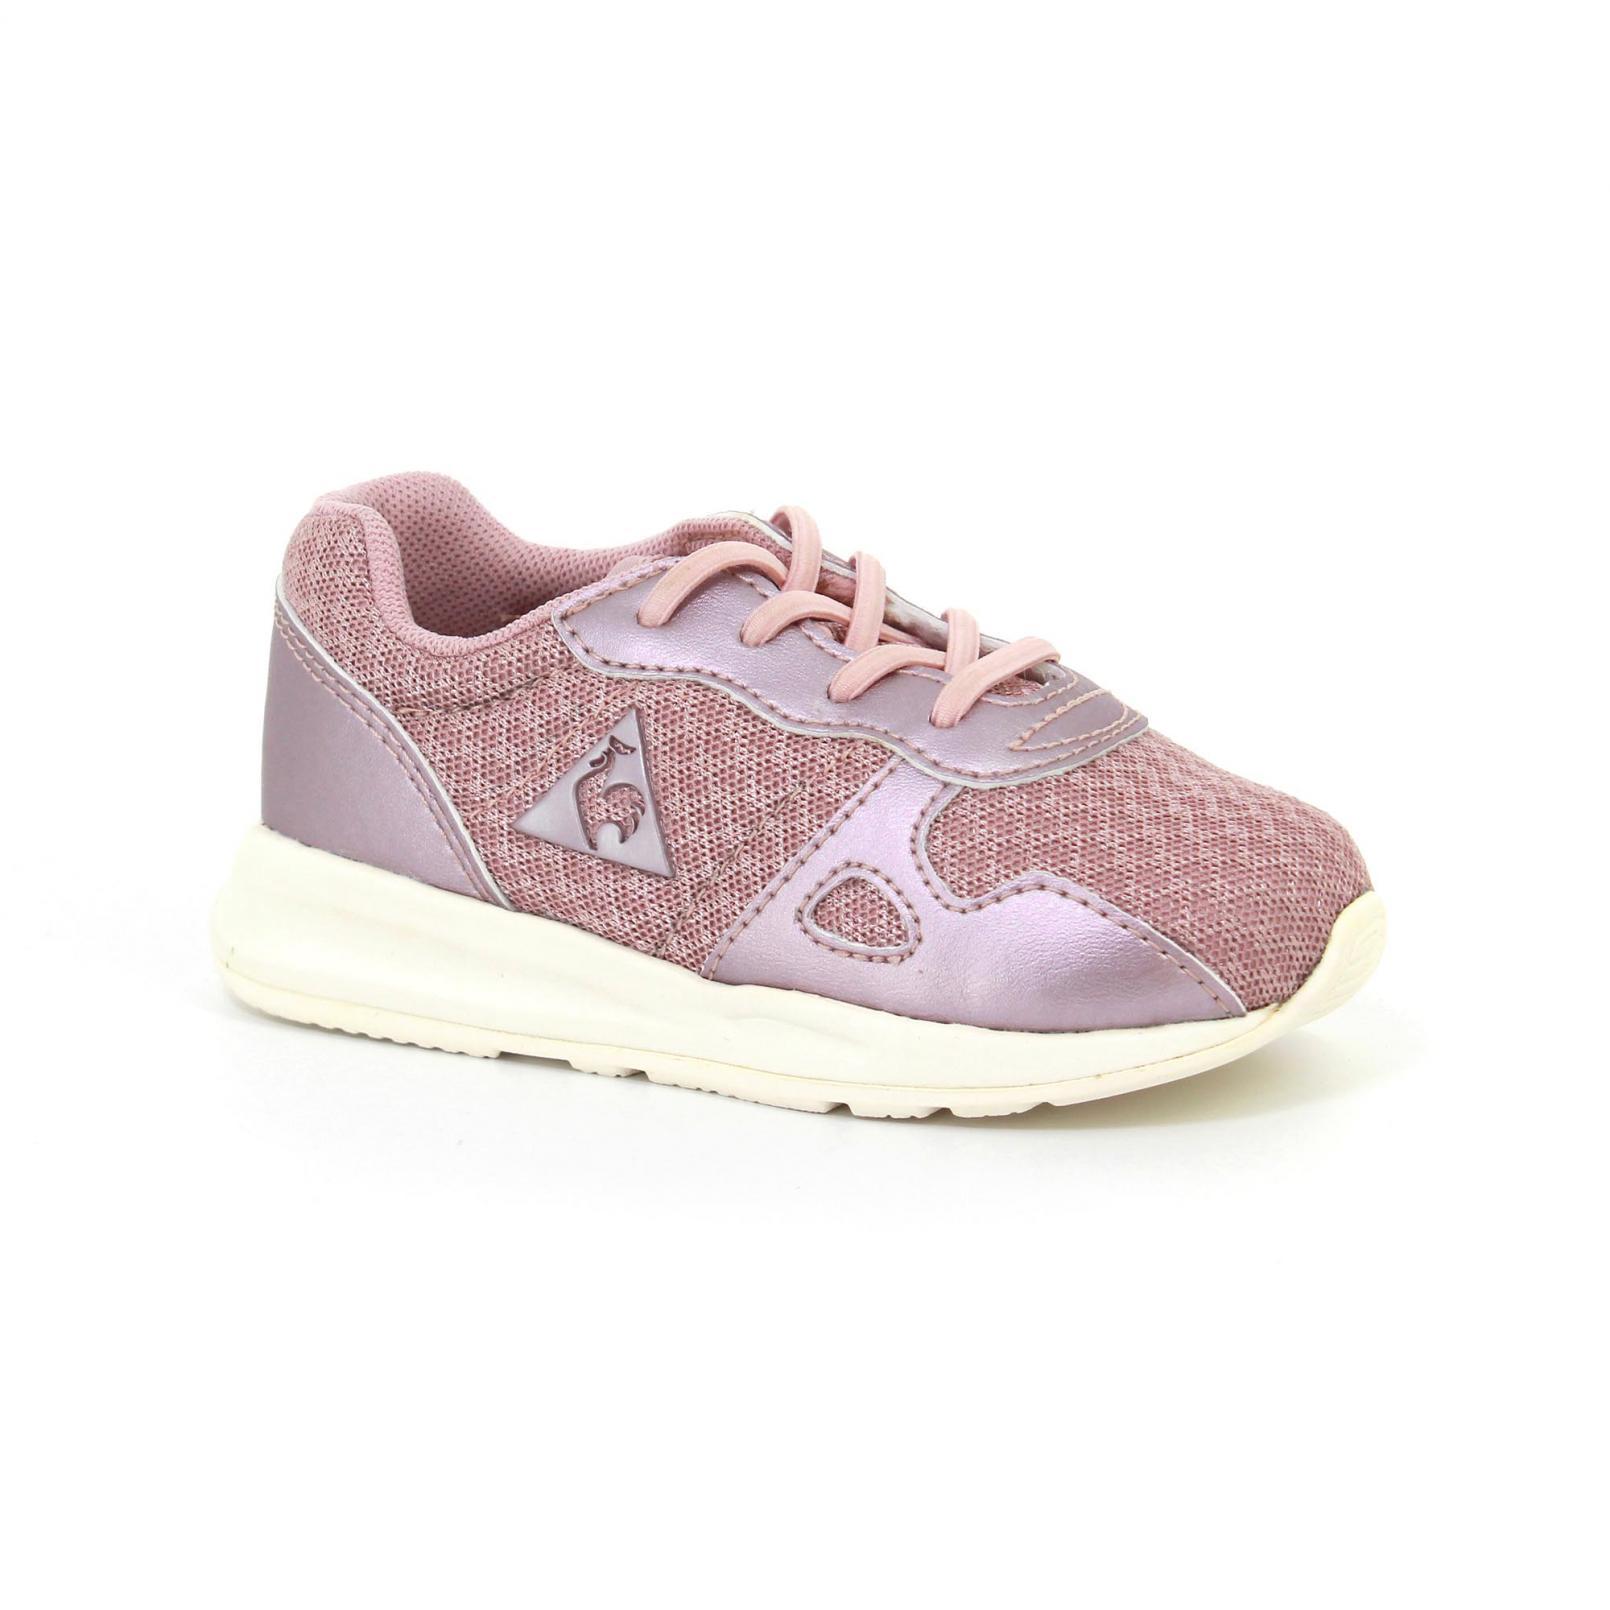 Shoes – Le Coq Sportif Lcs R600 Inf Feminine Mesh/Metallic Pink/Pink